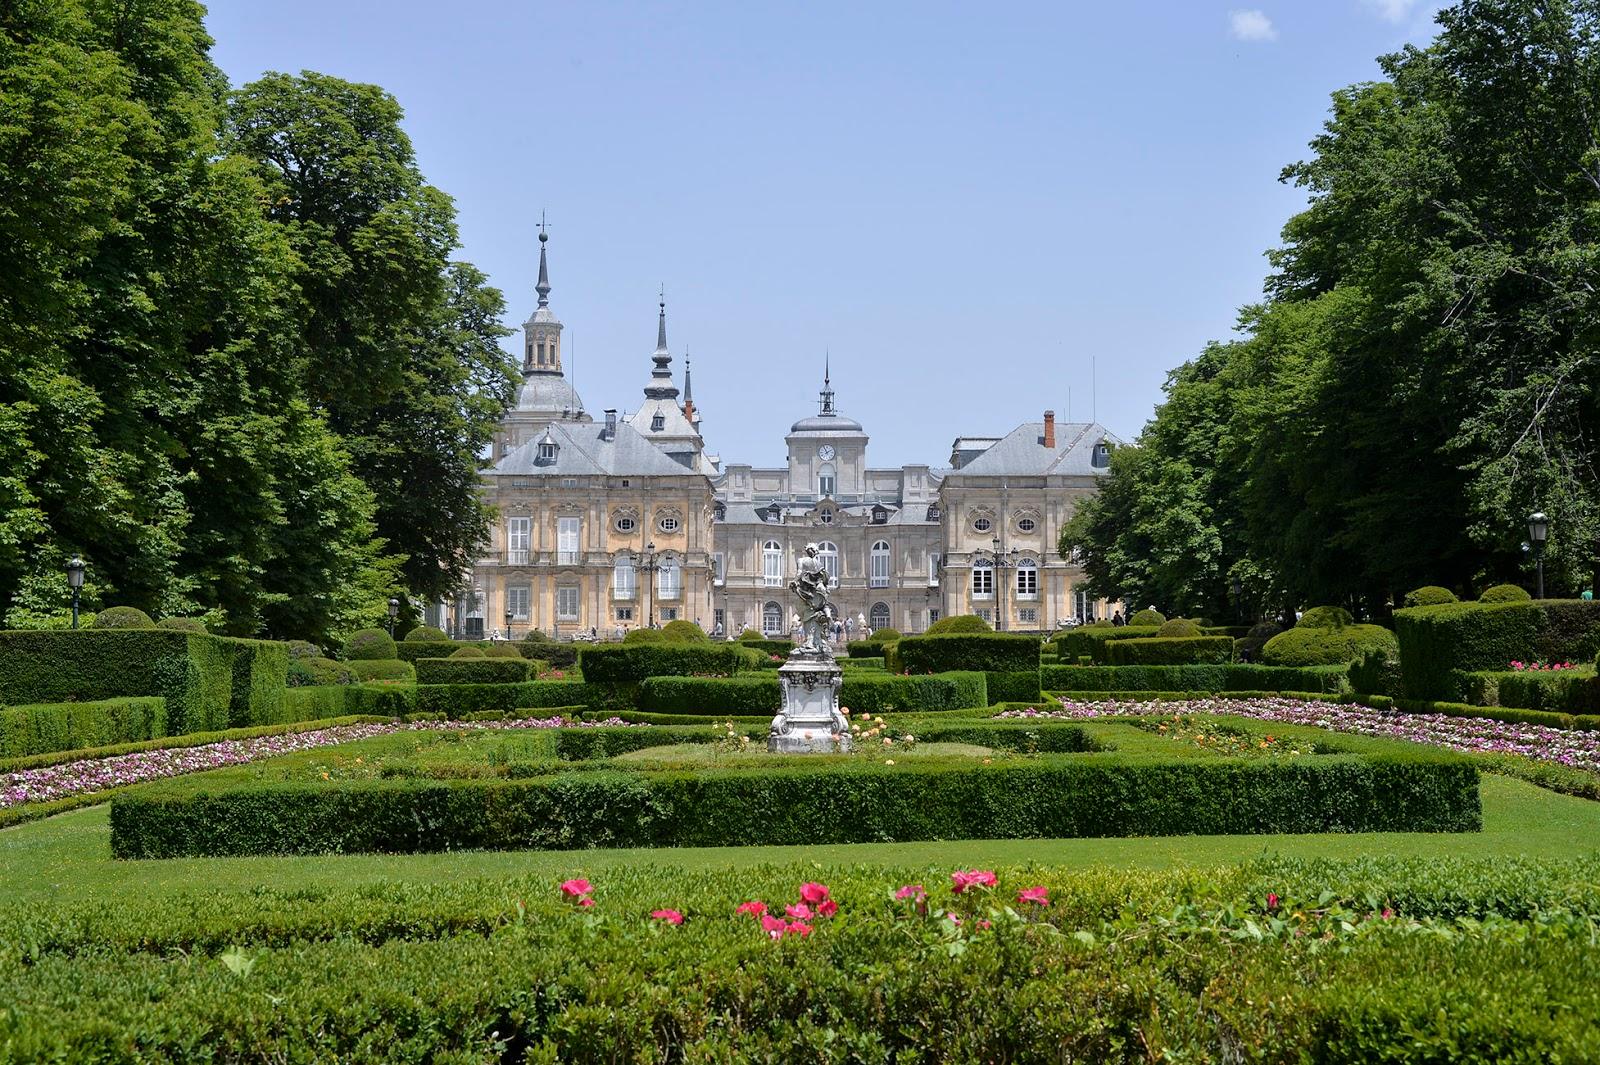 segovia spain travel guide weekend la granja san ildefonso royal palace